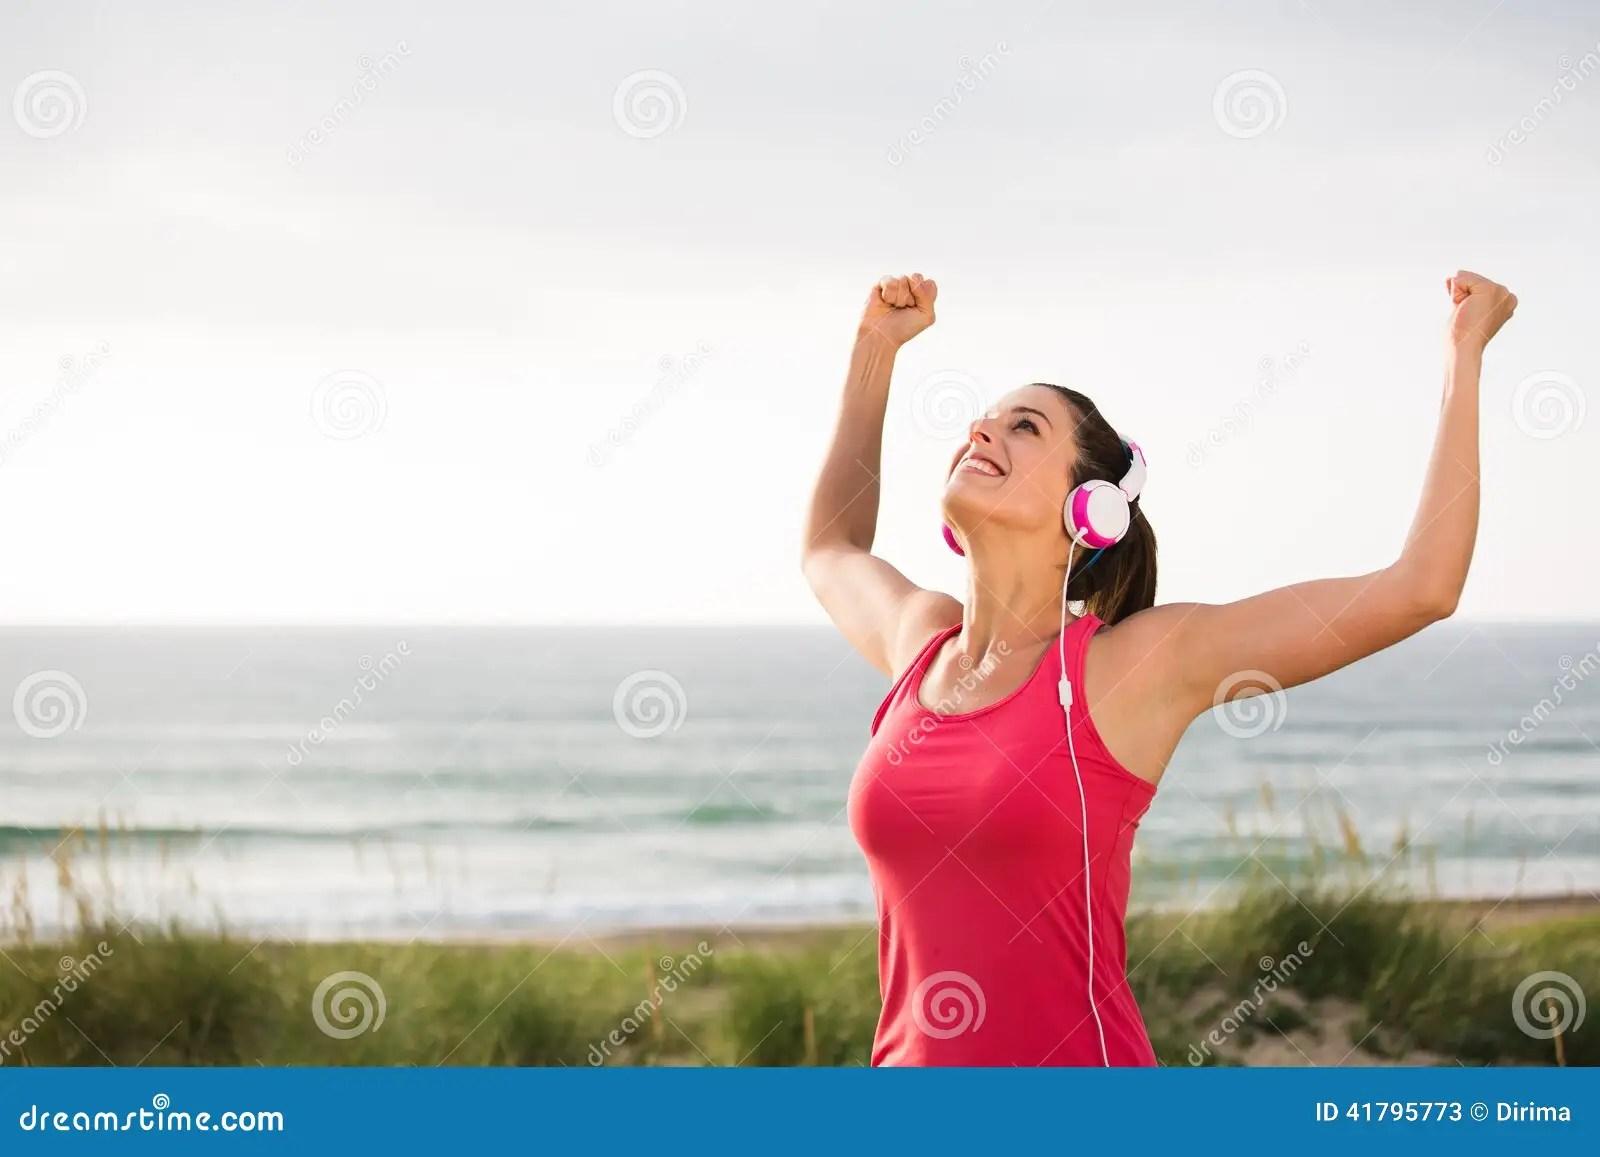 Female Successful Athlete Celebrating Fitness Goals Stock